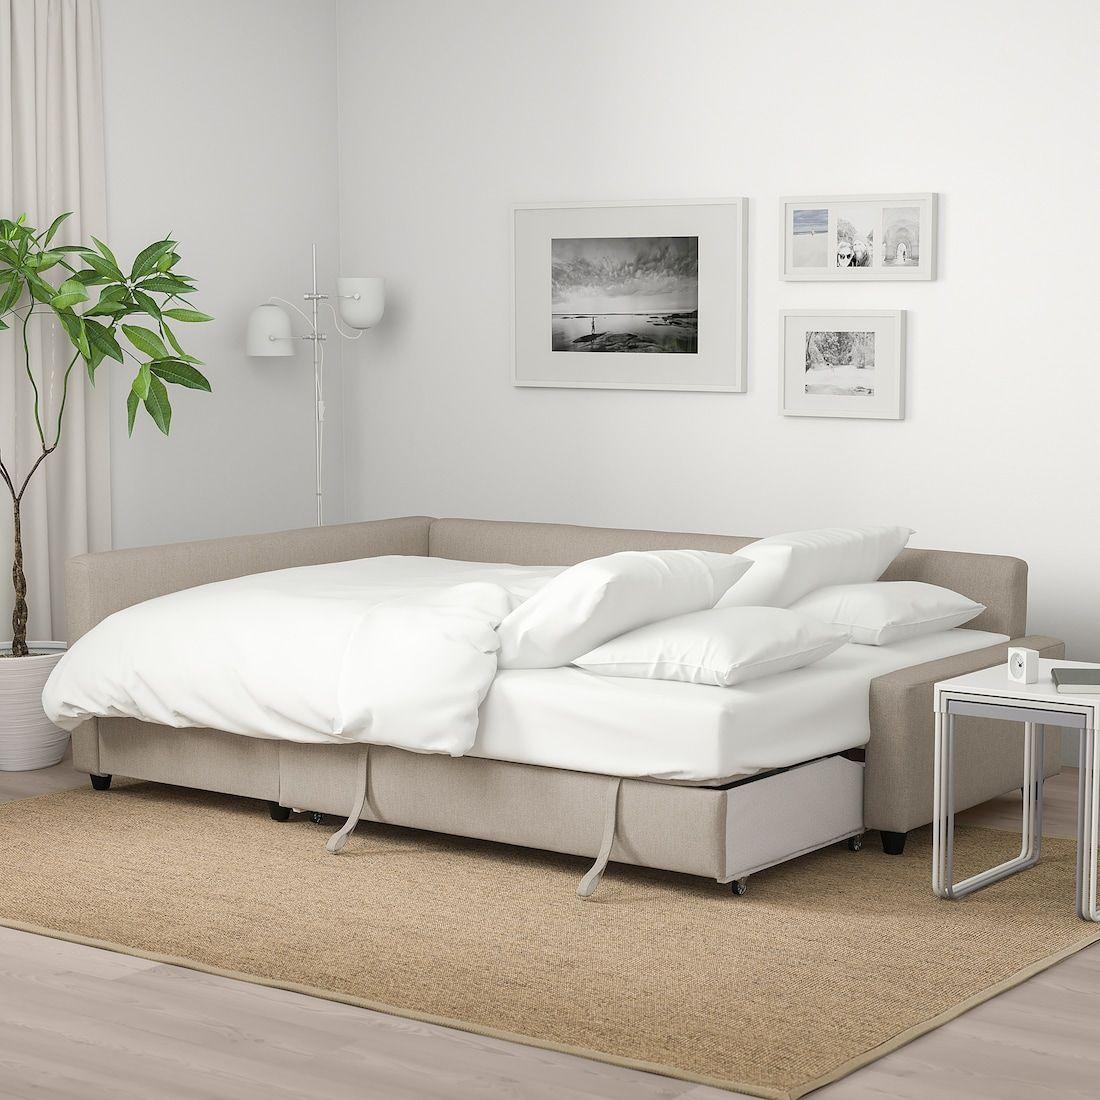 Ikea Friheten Corner Sofa Bed With Storage Hyllie Beige Canape Lit Angle Lit Avec Rangement Integre Et Canape Angle